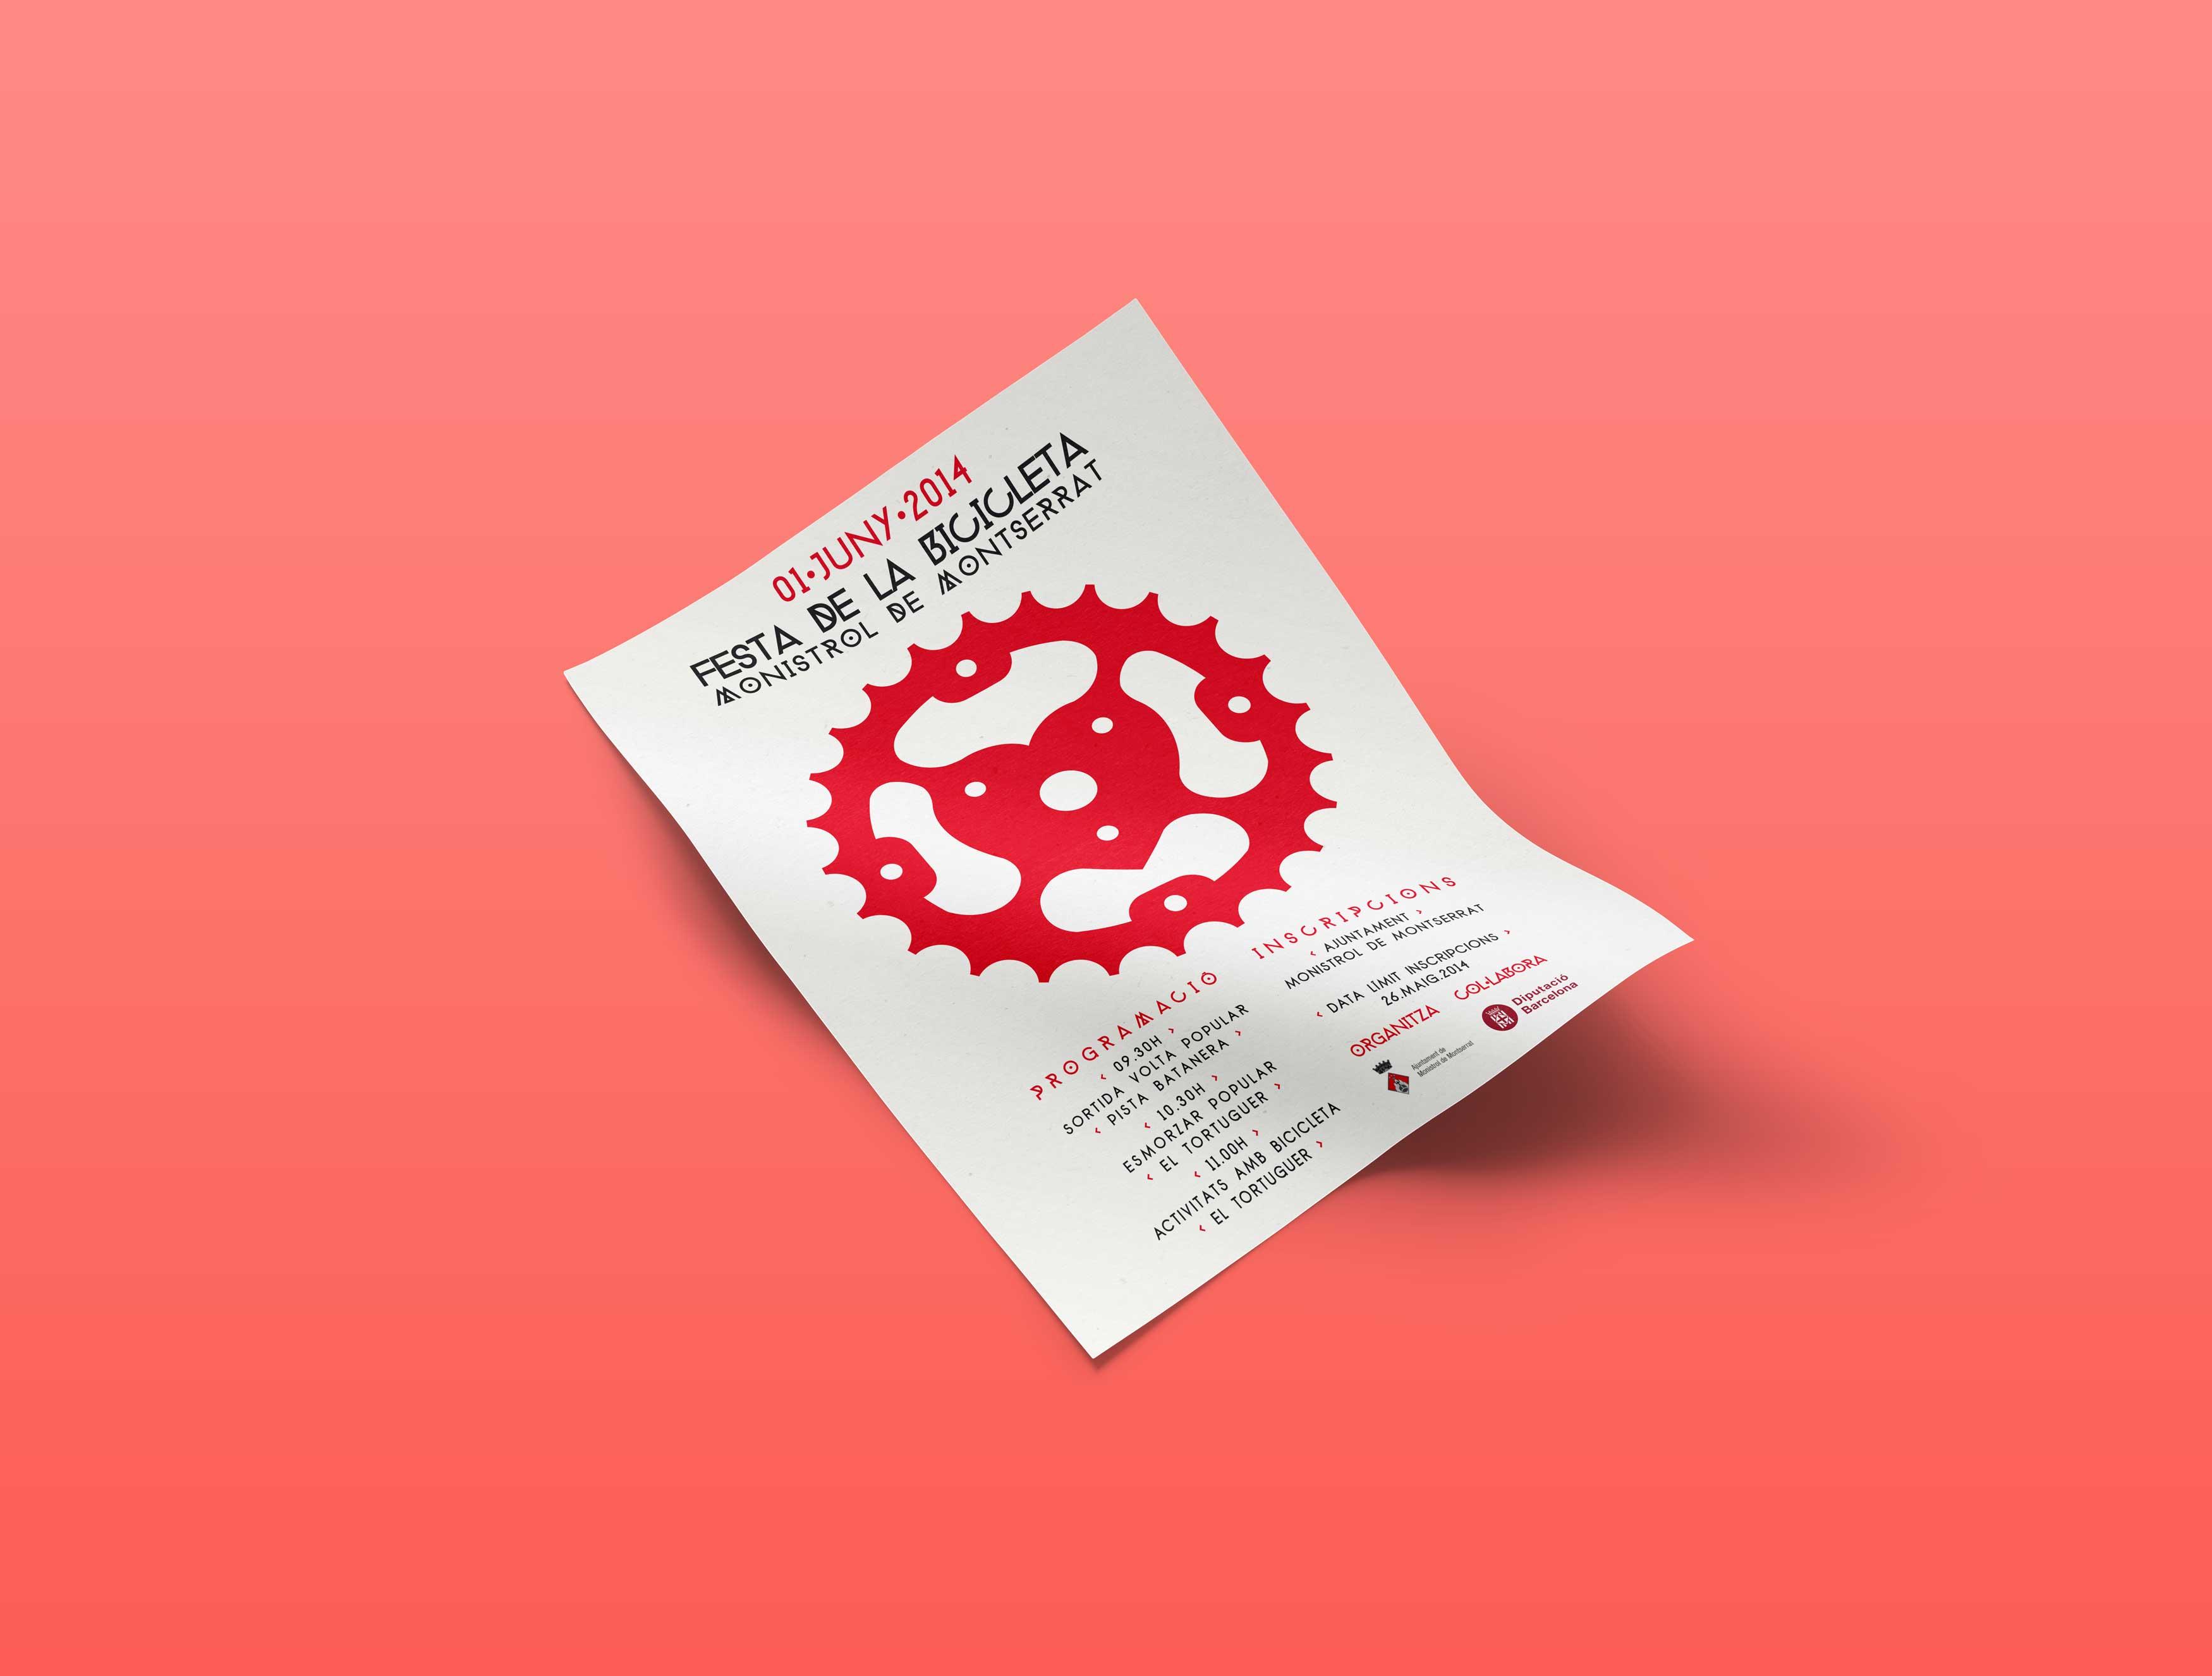 Pedalada-2014-Monistrol-Montserrat-disseny-poster-02